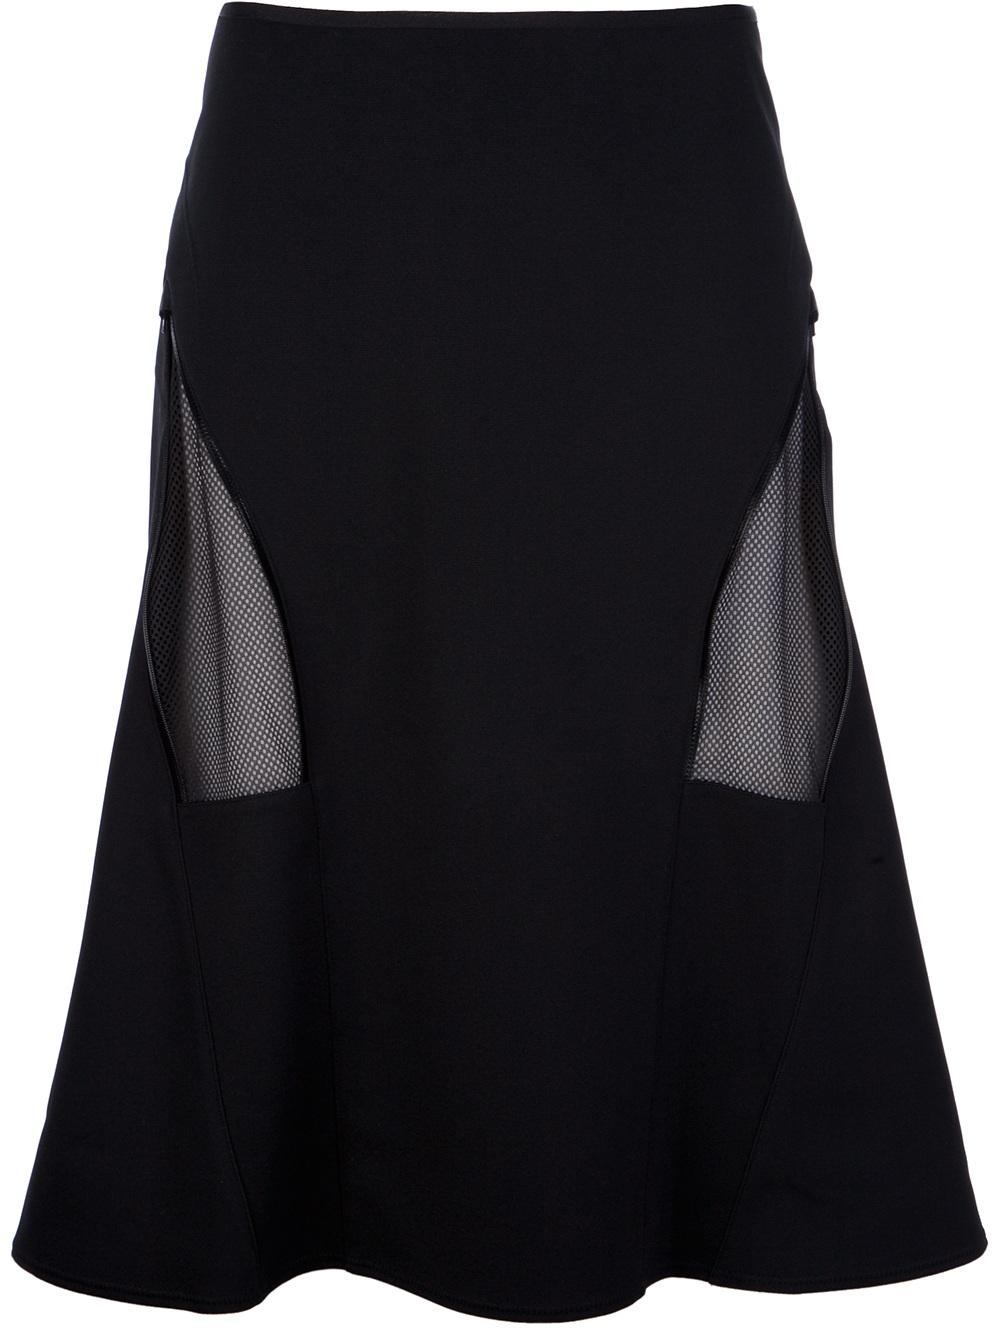 Junya watanabe Net Panel Midi Skirt in Black | Lyst